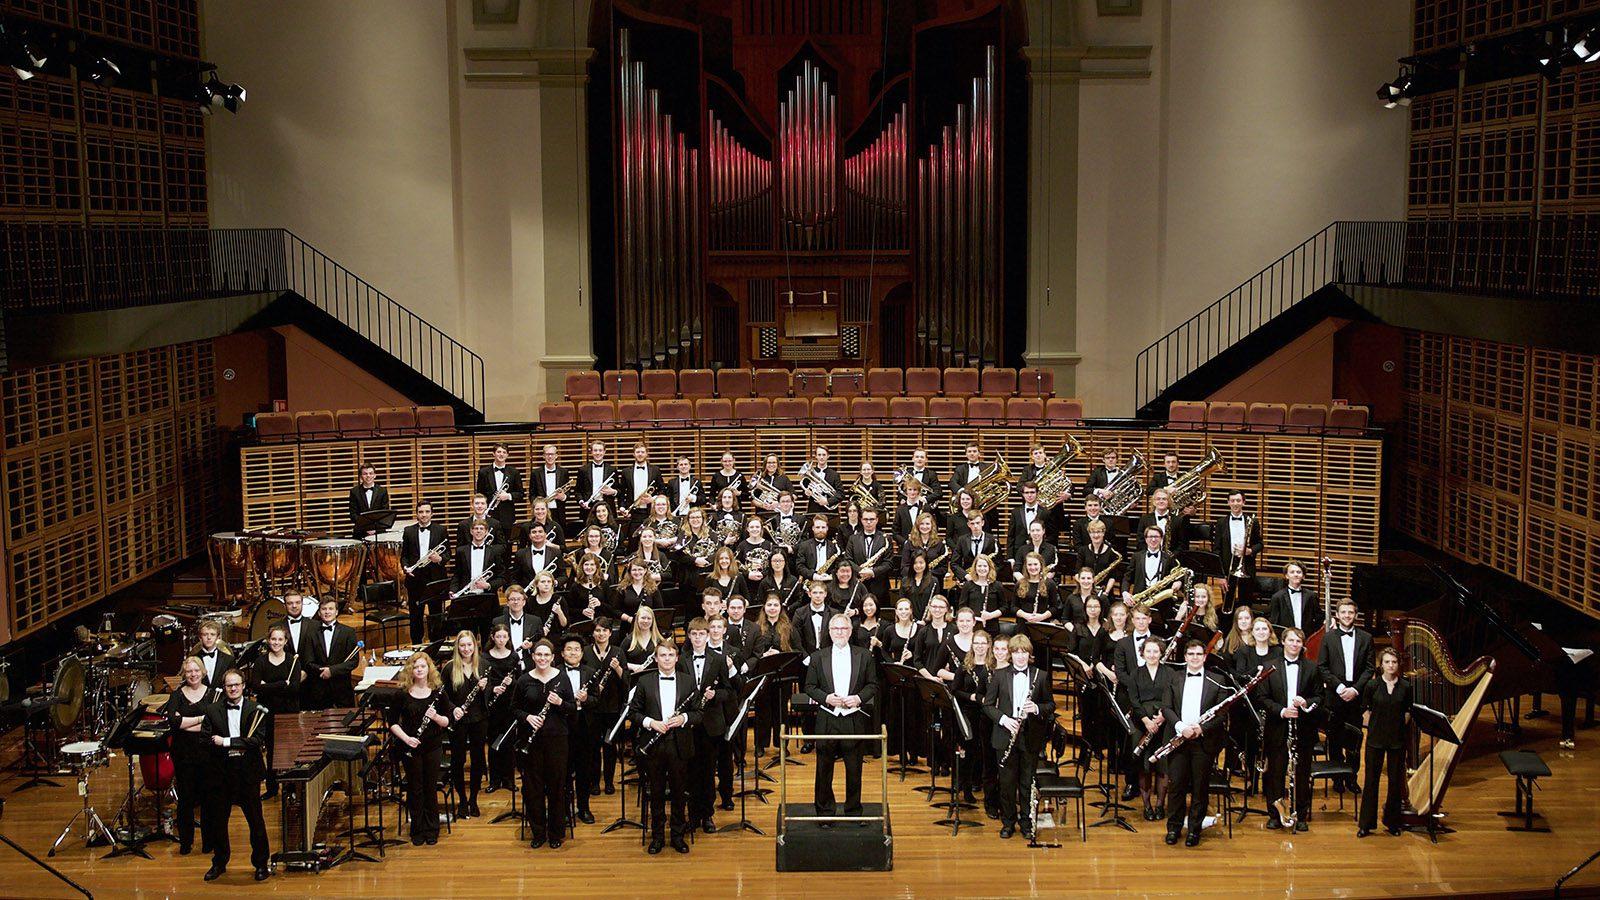 Gift to make music ensemble international tours cost-free